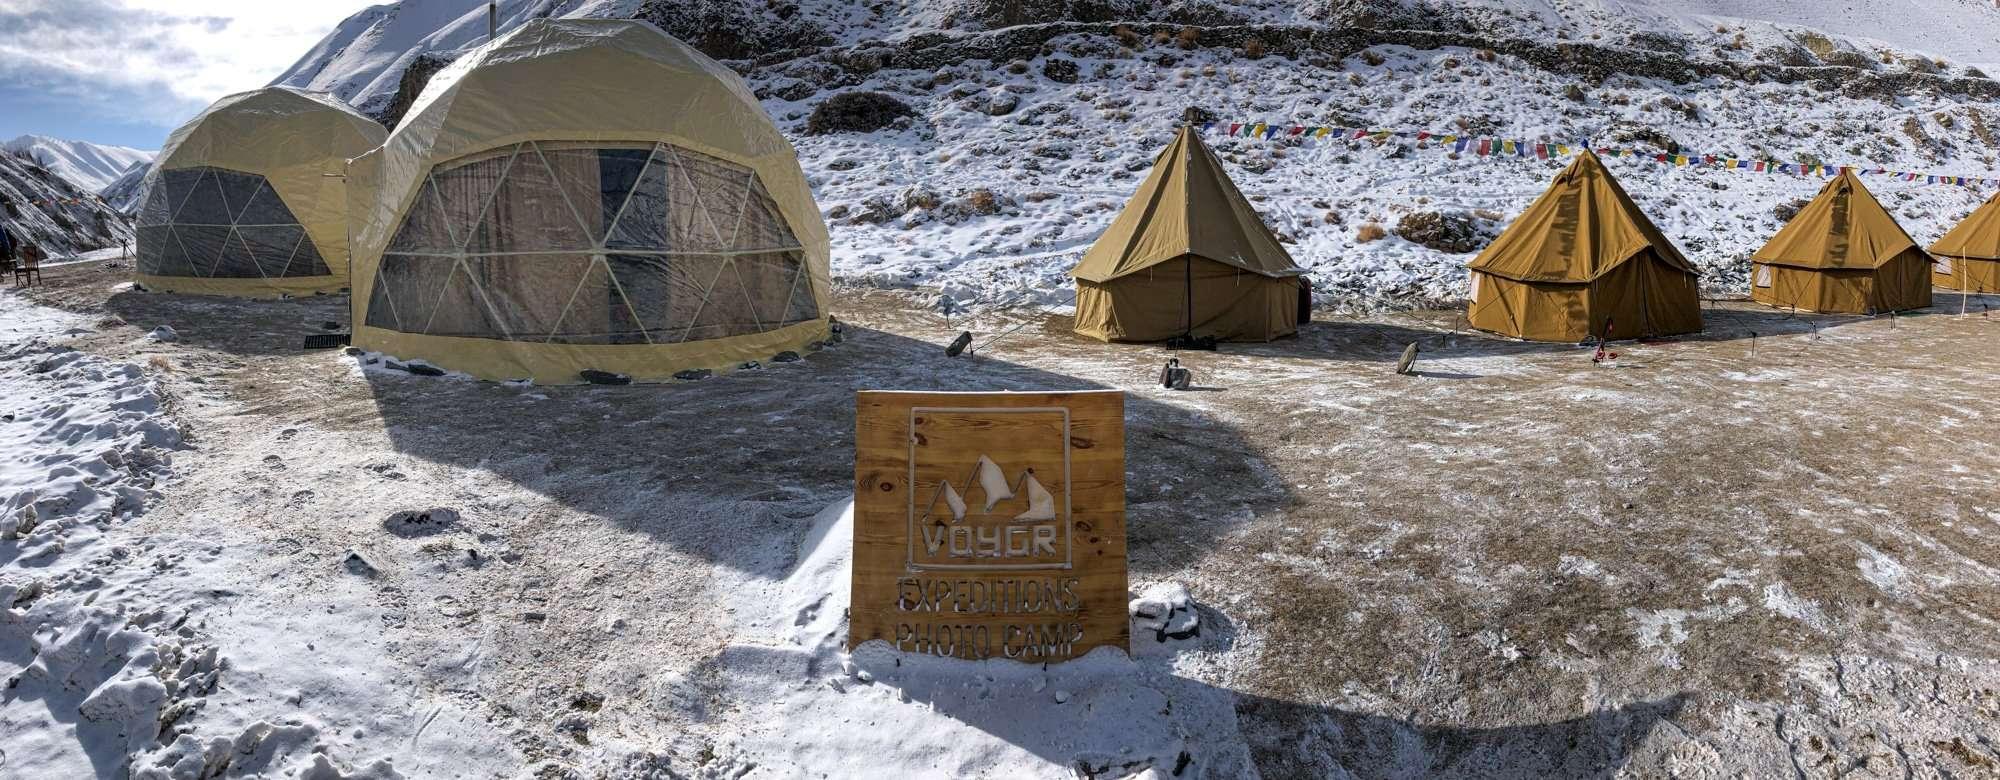 Voygr Camp - Snow Leopard Tour